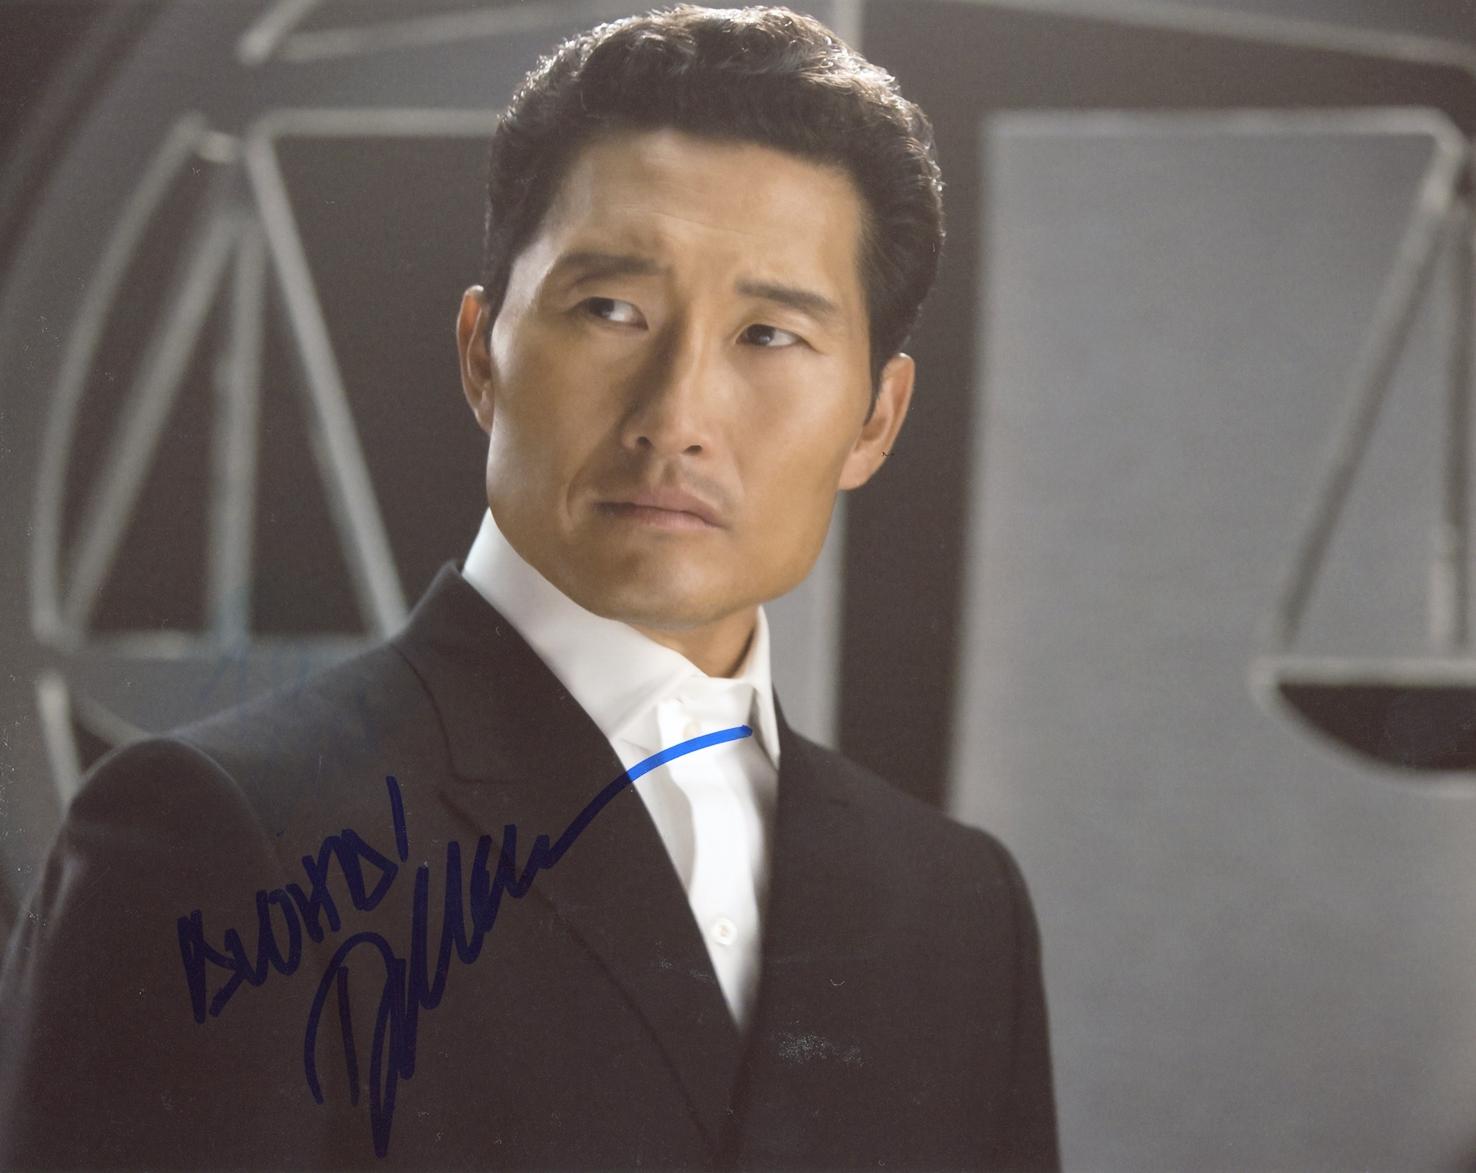 Daniel Dae Kim Signed Photo